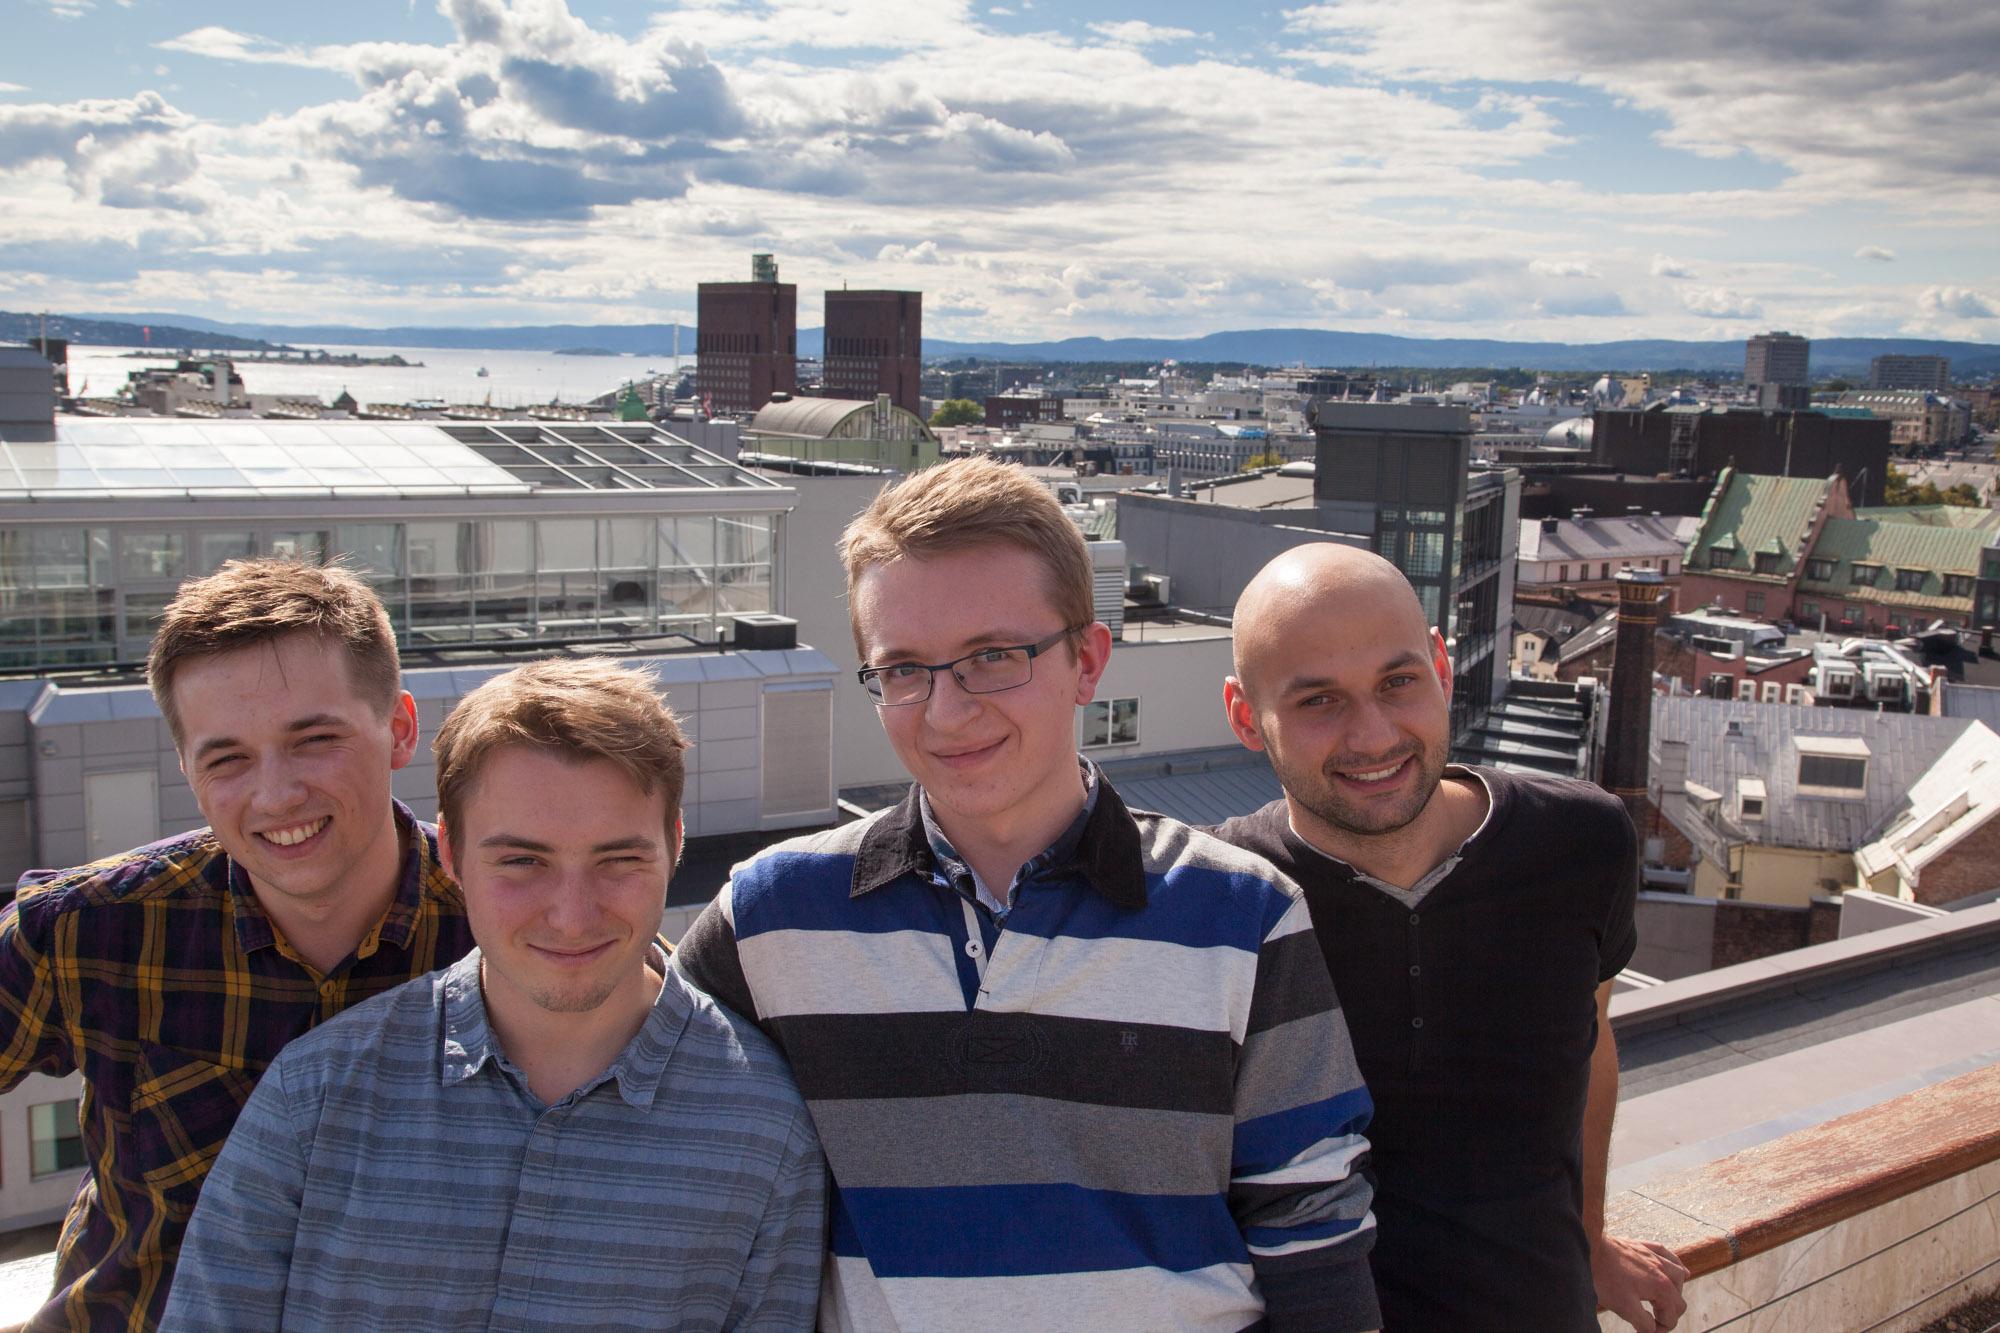 The summer interns 2014 visiting Oslo at the end of their program. From the left: Piotr Podolski, Jacek Żyła Radosław Chamot and Krzysztof Słonka